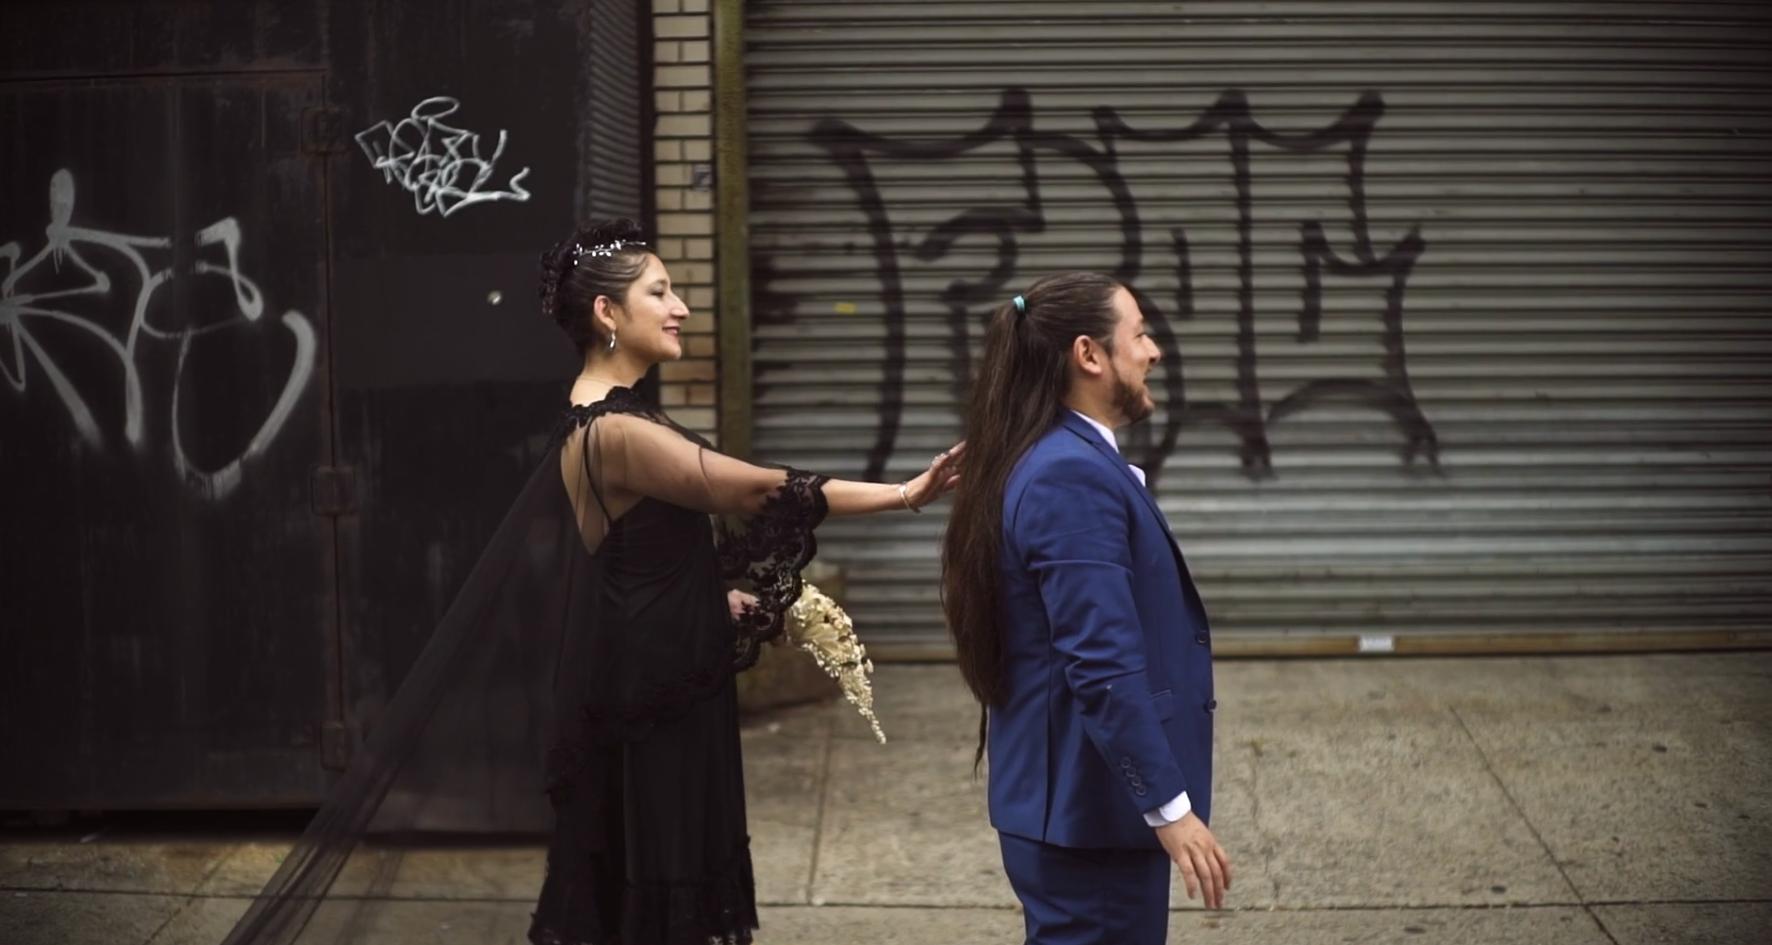 Giazu + Luis Matias   New York, New York   a private property